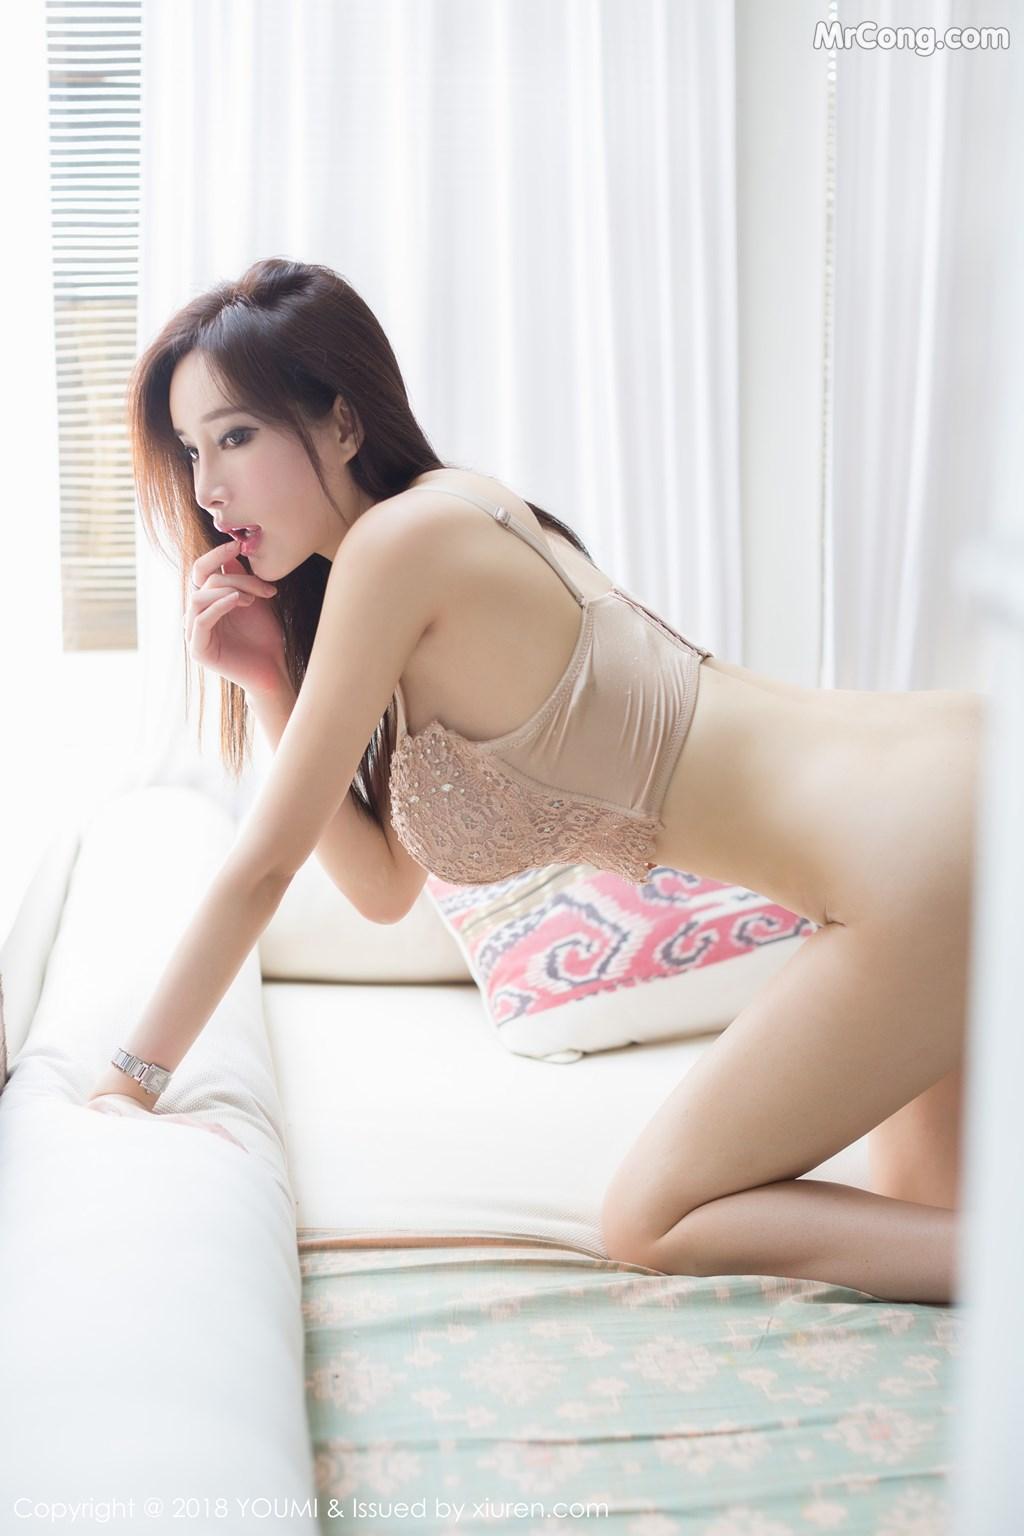 Image YouMi-Vol.197-Tu-Fei-Yuan-Ai-Cuo-Qiong-MrCong.com-005 in post YouMi Vol.197: Người mẫu 奶瓶土肥圆 (48 ảnh)